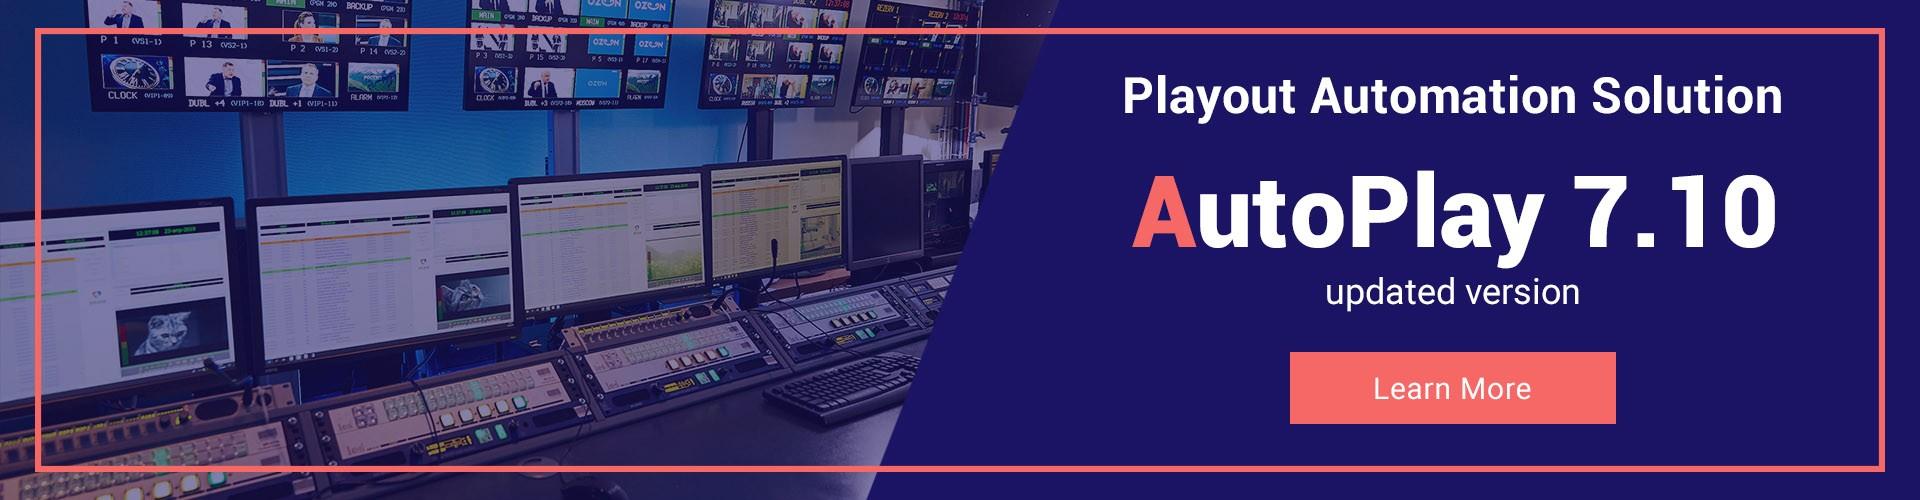 AutoPlay 7.10 updated version_banner